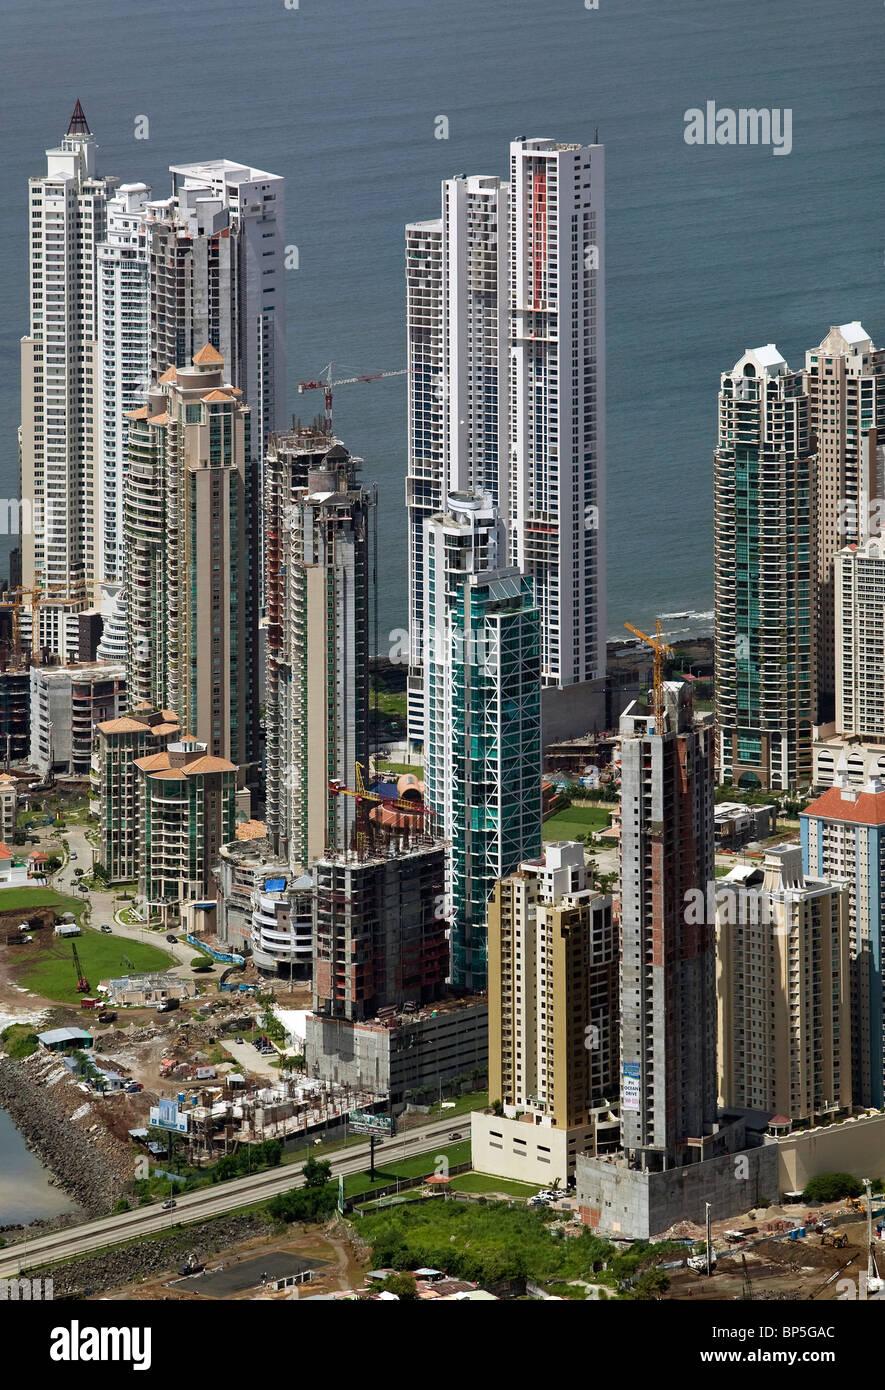 aerial view above high rises Panama City Republic of Panama - Stock Image